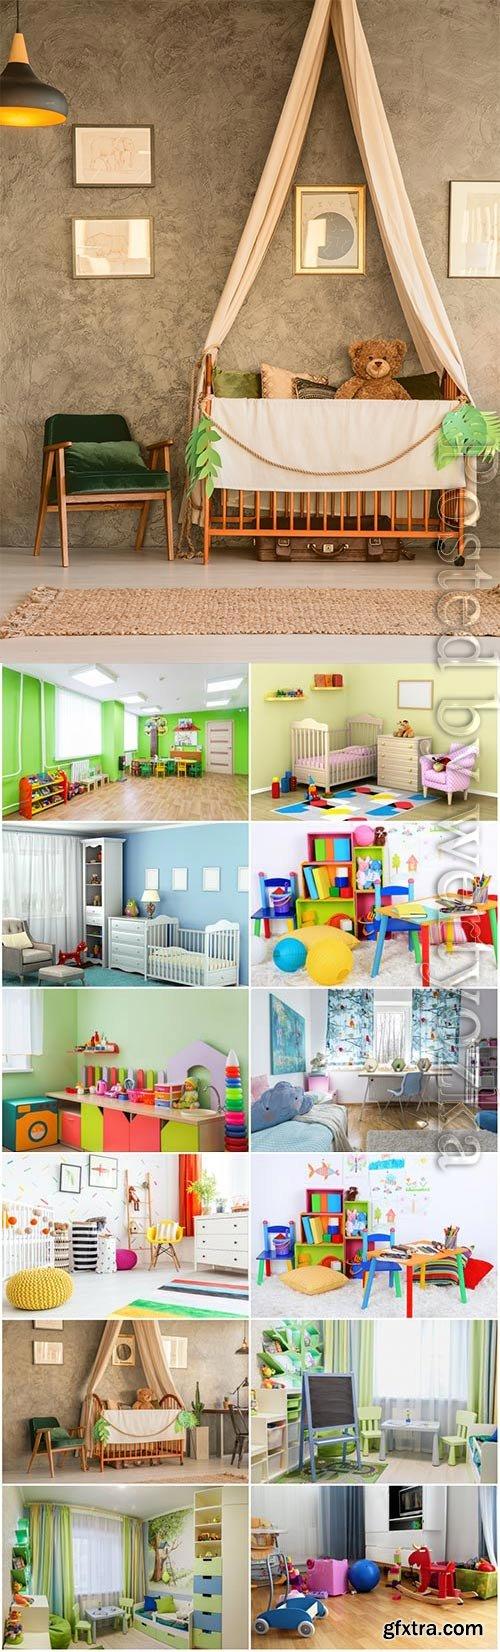 Creative kids room interior stock photo